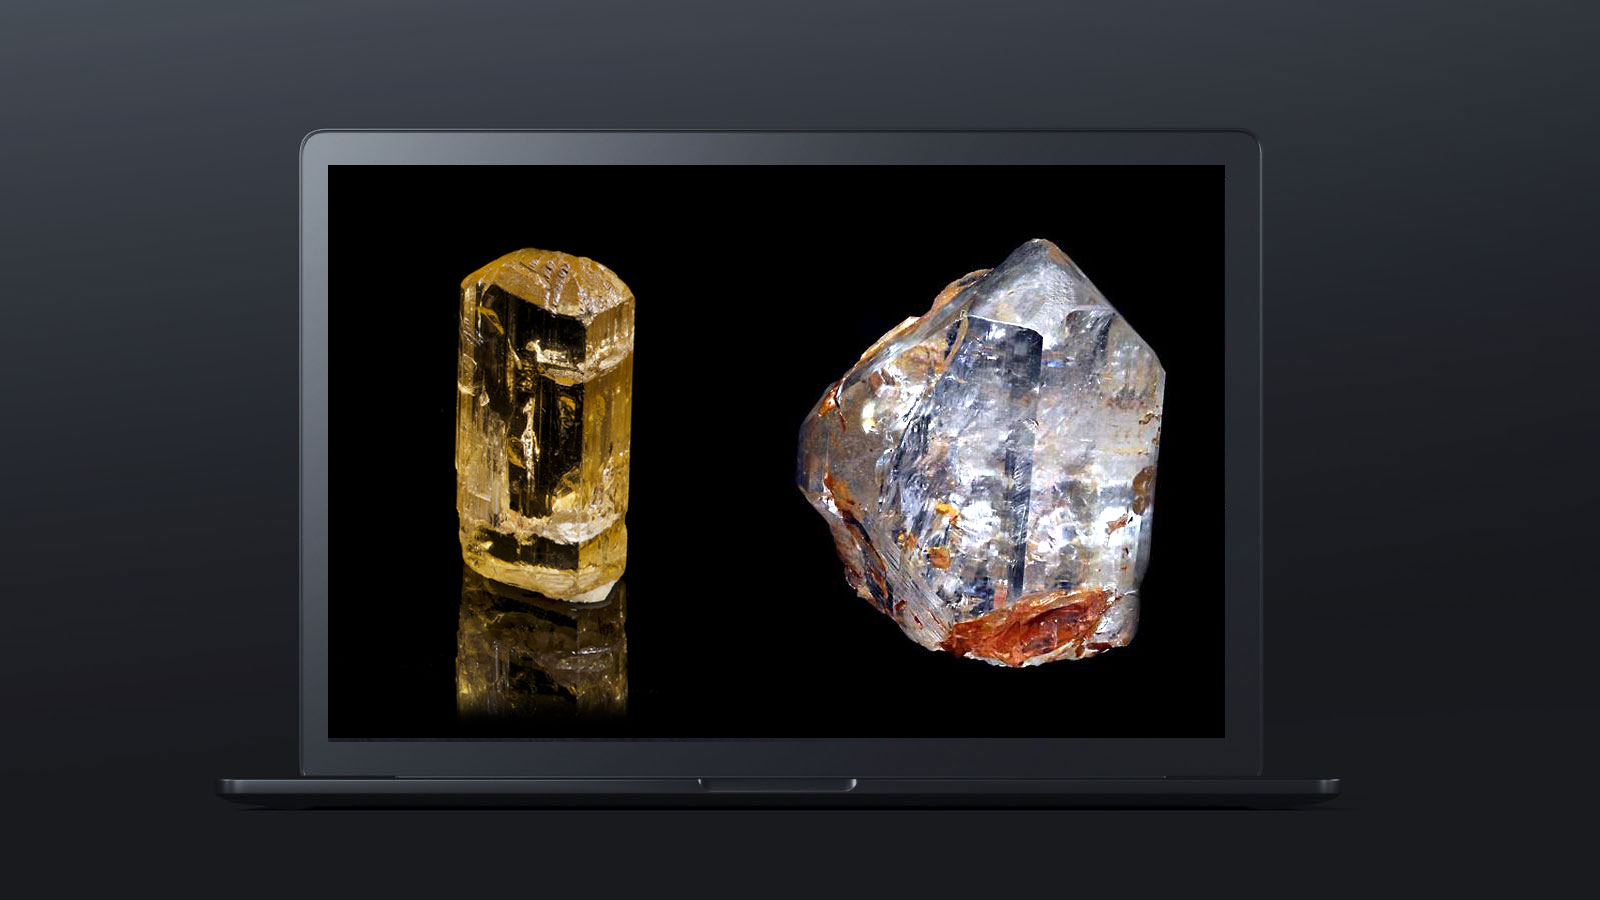 10 worlds rarest gemstones 2jpg - ده گوهر کمیاب دنیا کدامند؟